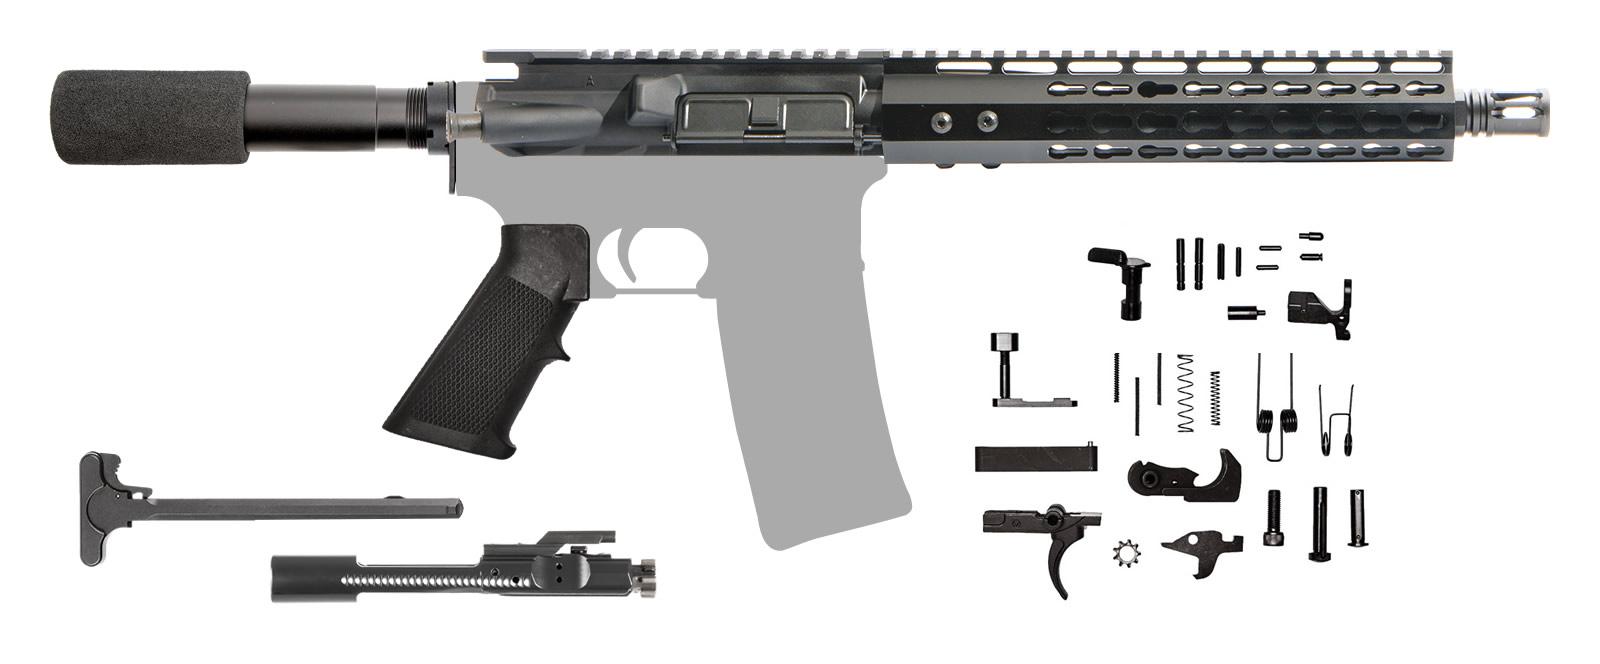 "AR-15 AR Pistol Kit 10.5"" .223 / 5.56 NATO Keymod Rail"